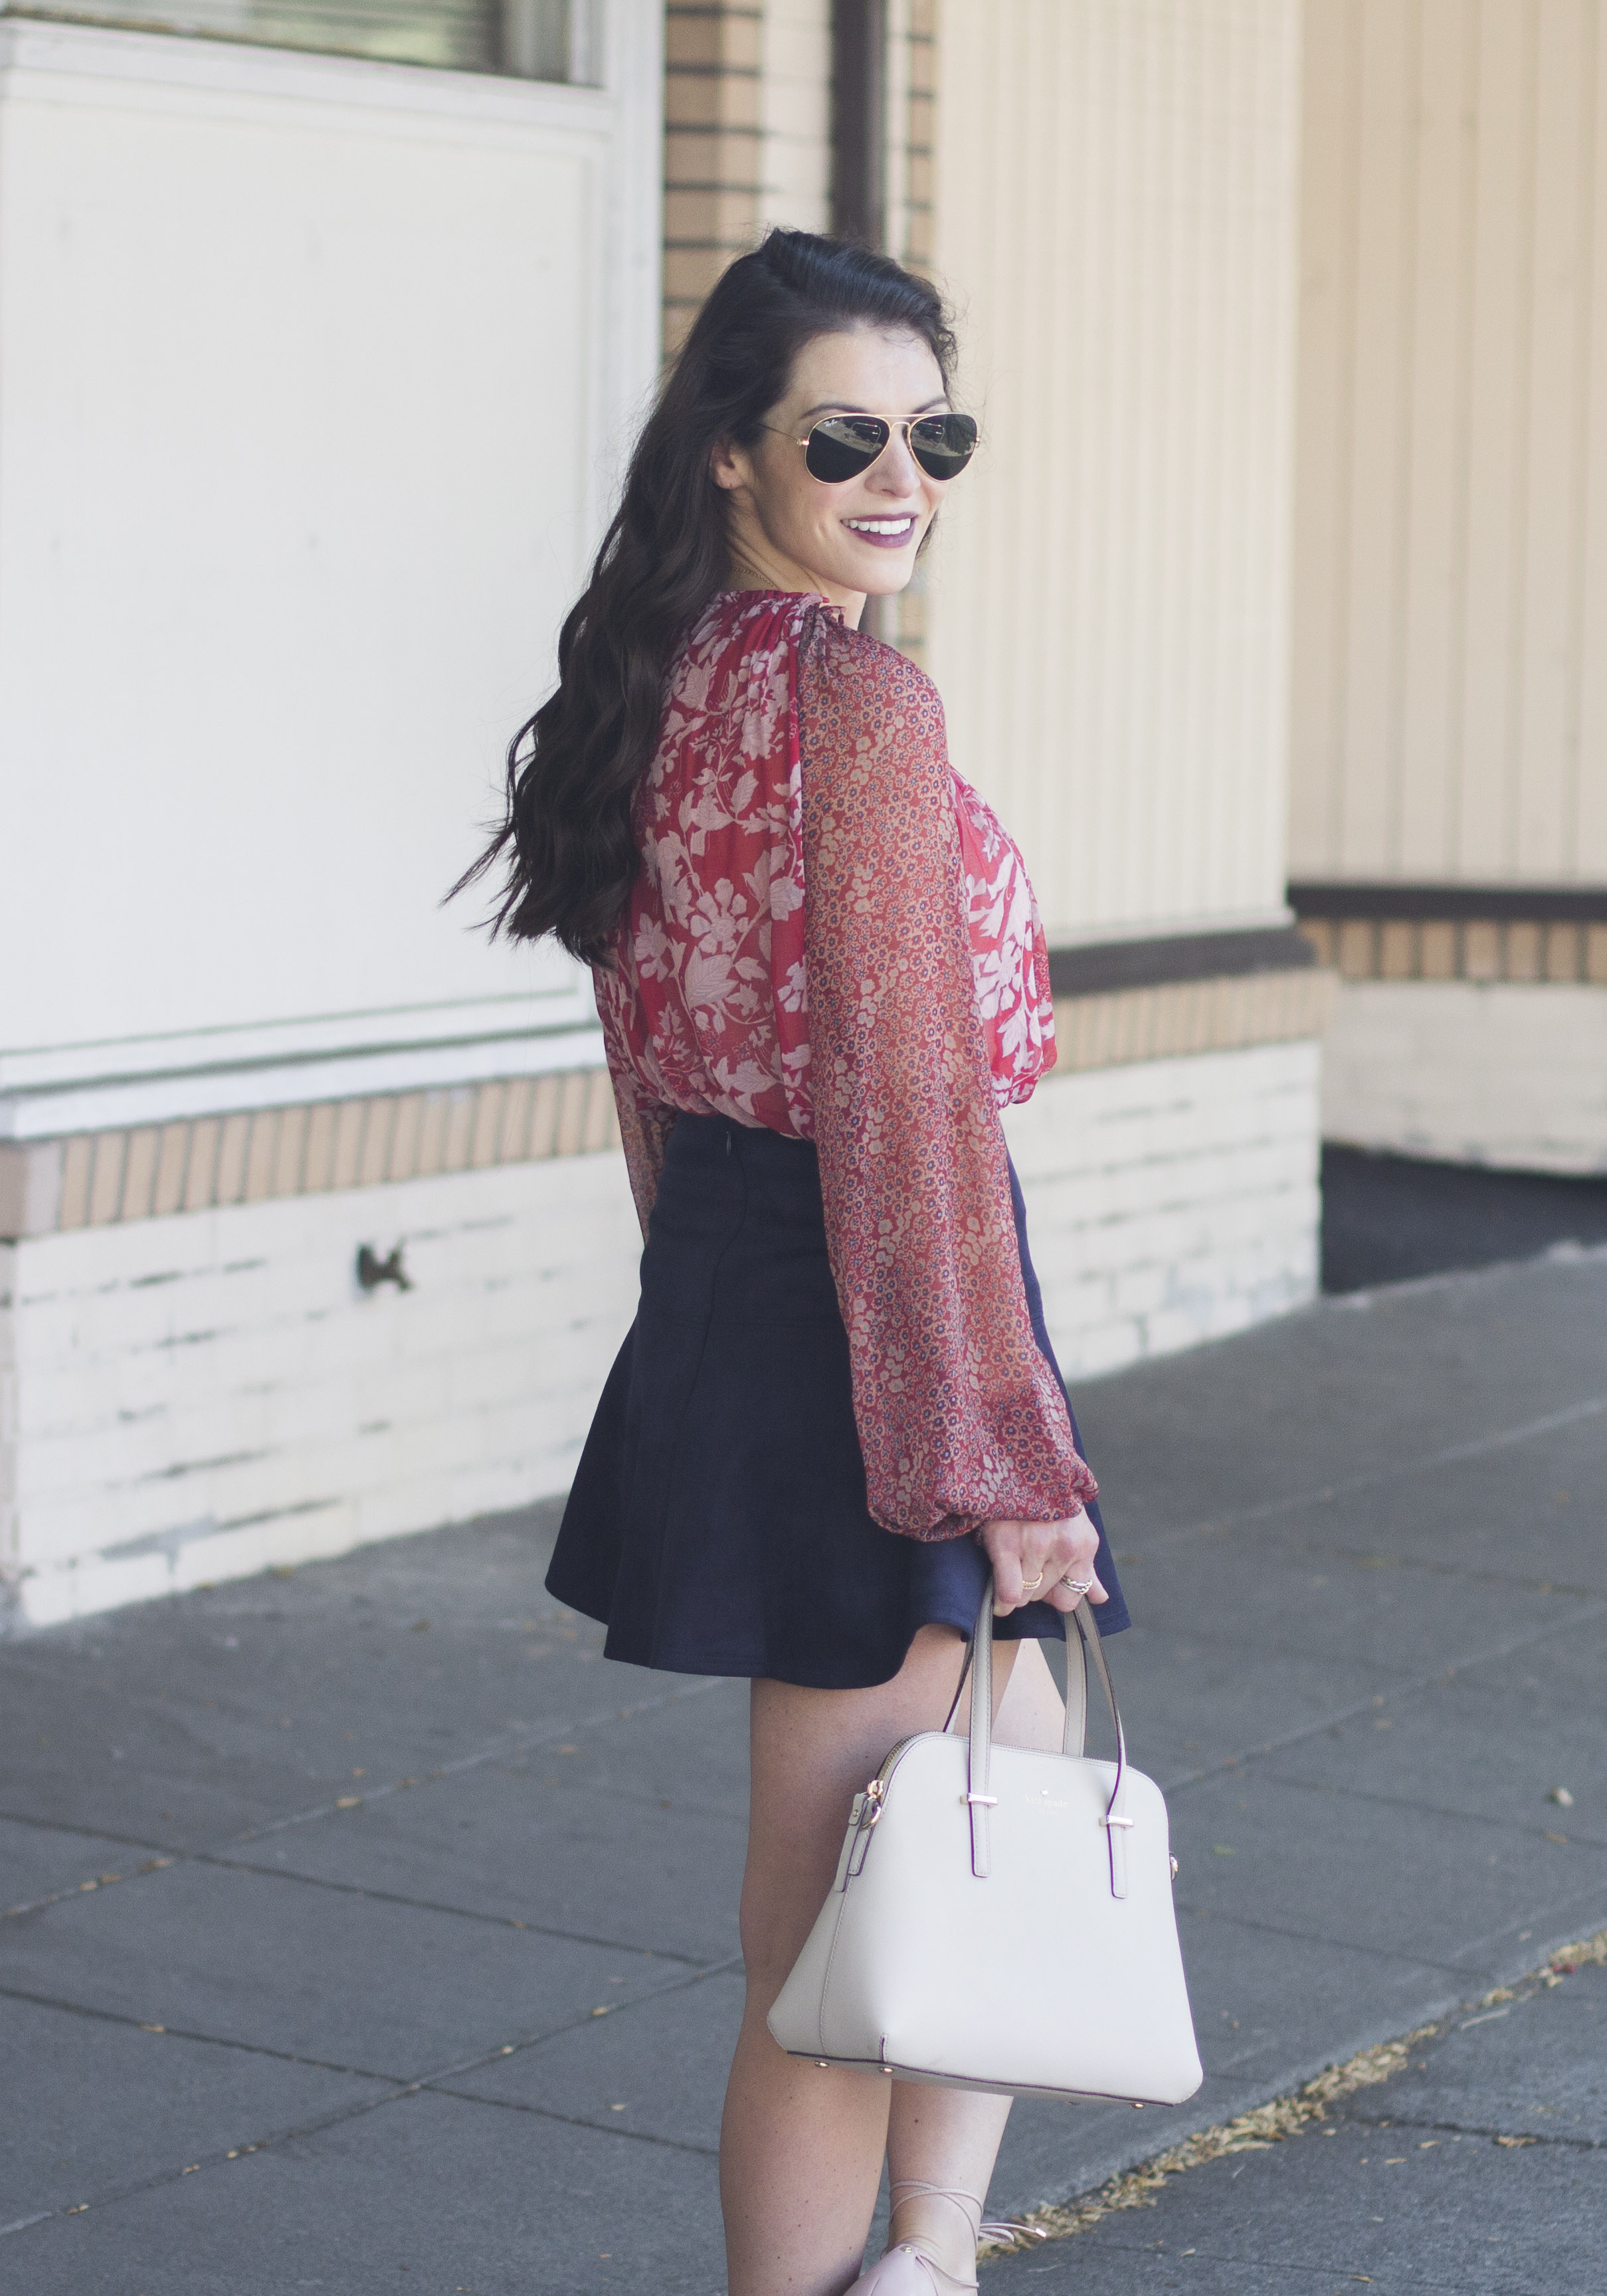 BB Dakota Abrams Skirt, Free People Hendrix Blouse, Kate Spade Cedar Street Maise Handbag, Halogen 'Owen' Ghillie Lace-up Flats, Ray-Ban Aviator Sunglasses, Cute Fall Outfits